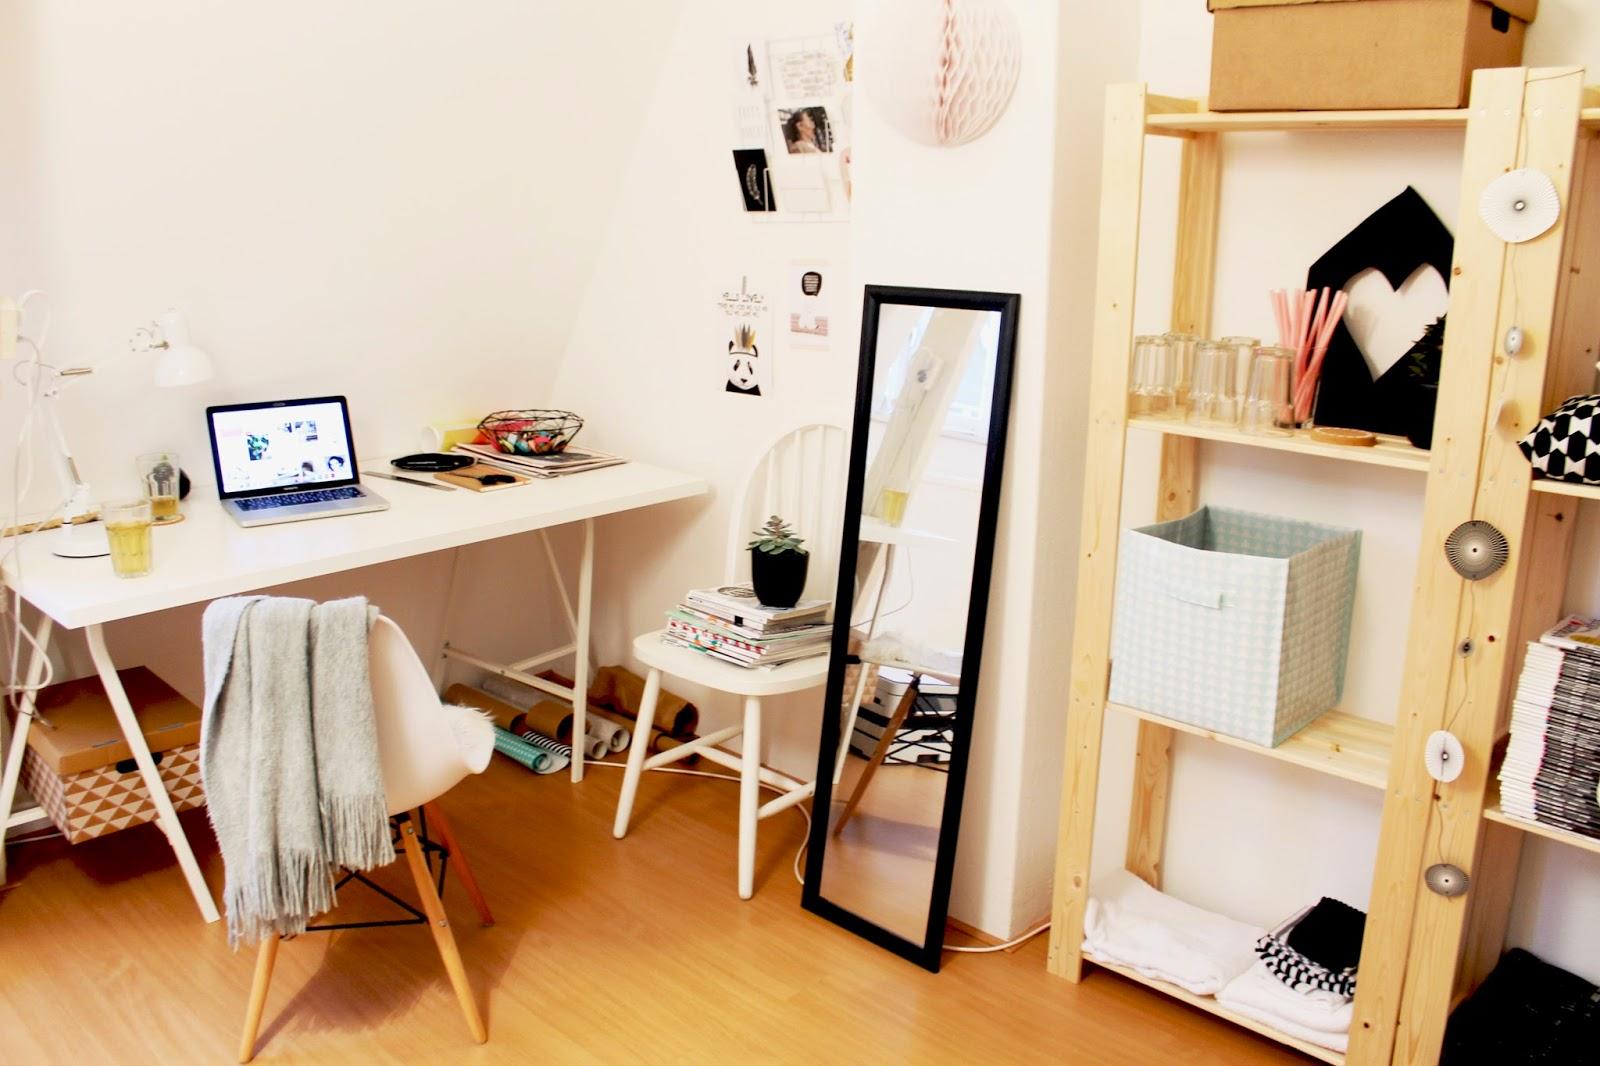 kleine kamer student ~ lactate for ., Deco ideeën